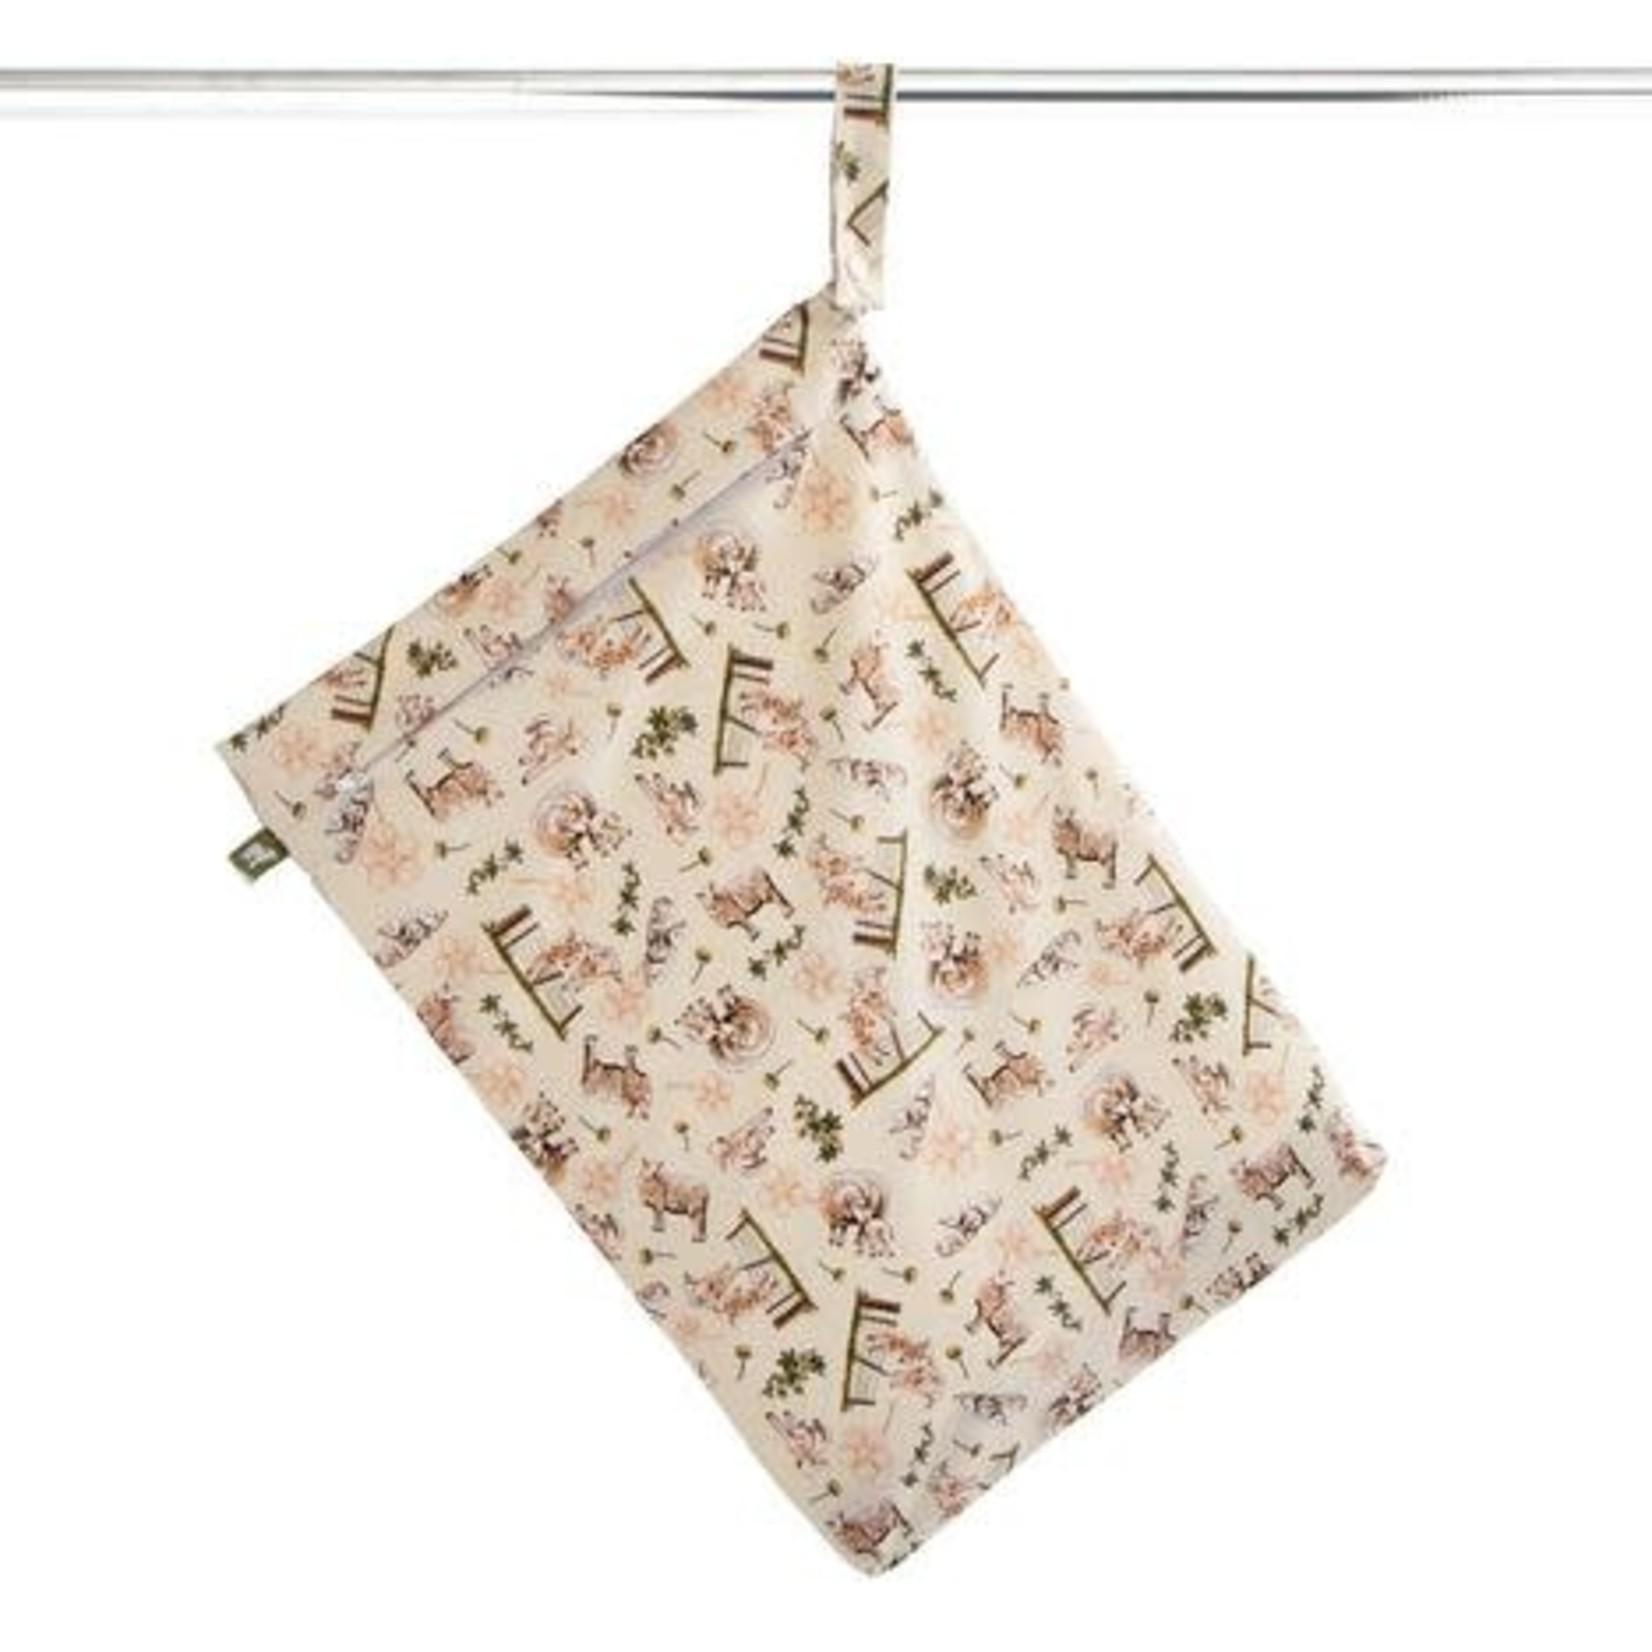 LittleLamb Wetbag XL (Loving ewe)